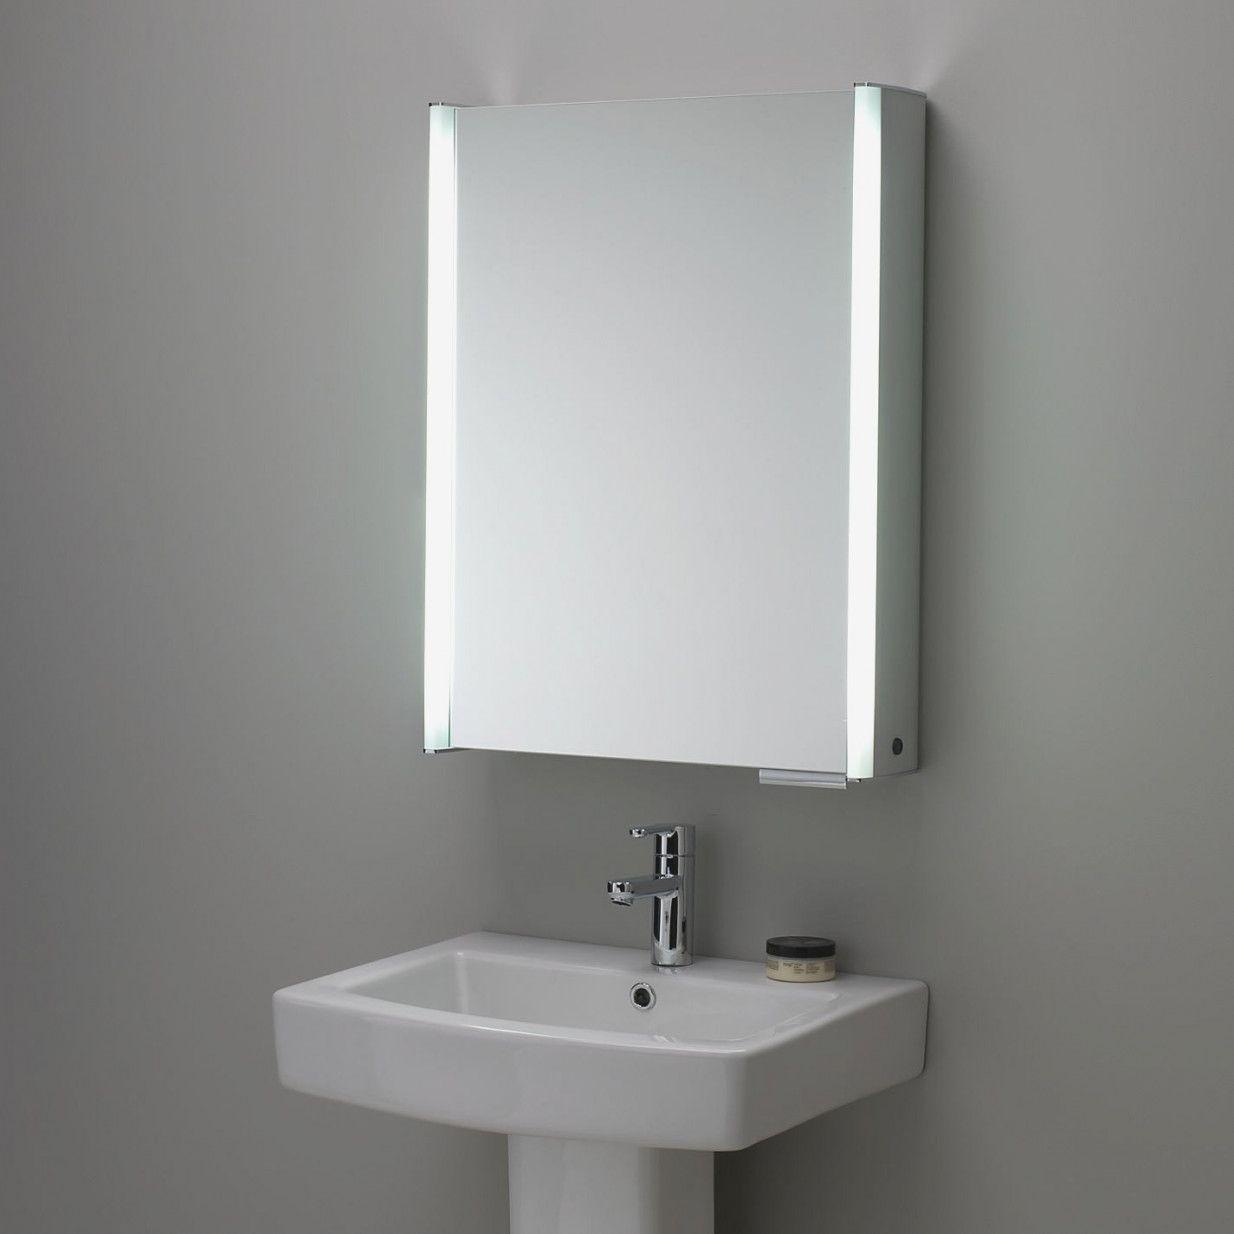 2018 Led Corner Bathroom Cabinet - Best Interior Paint Colors Check ...